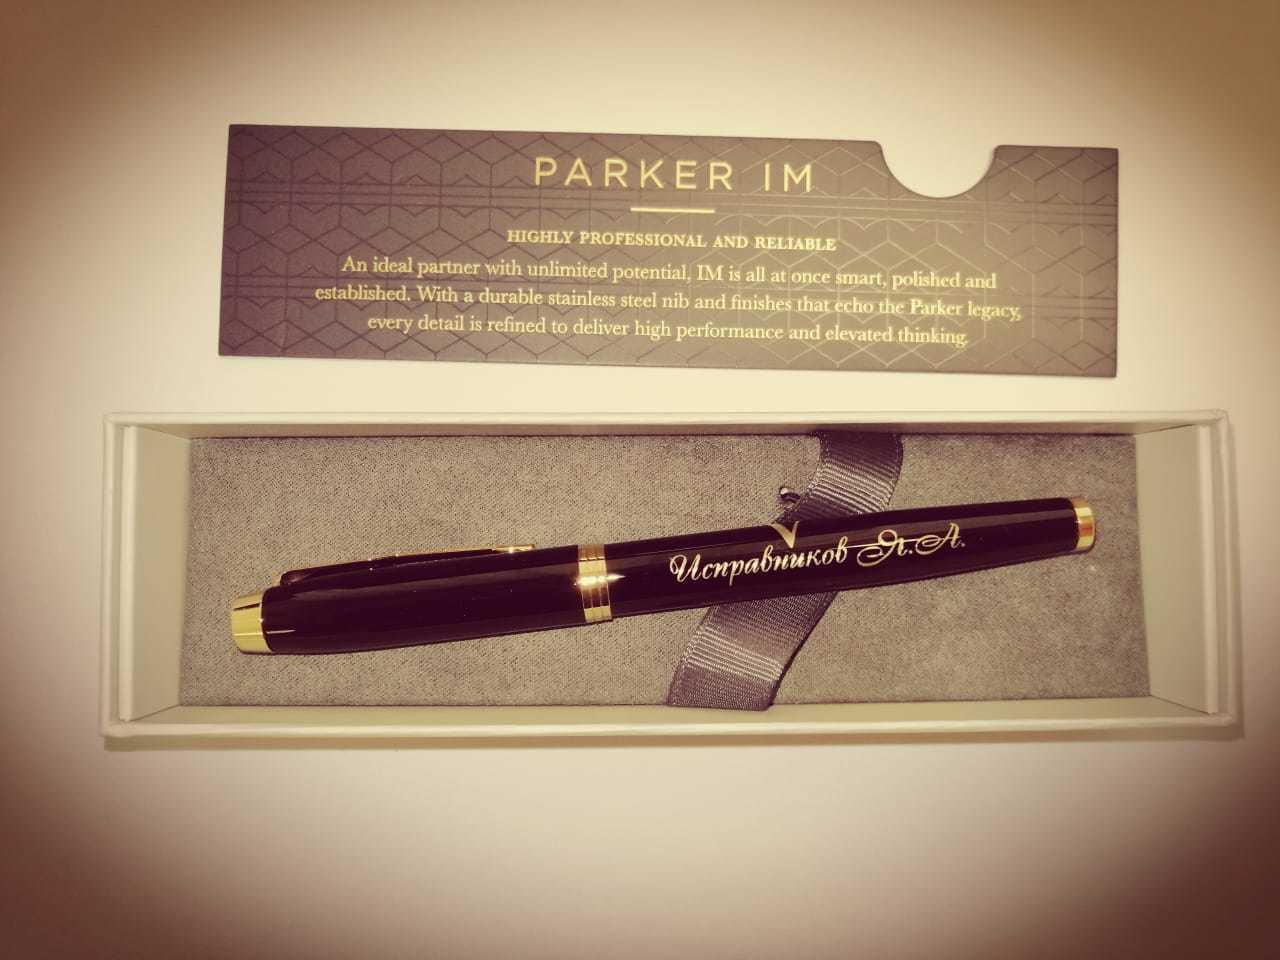 Пример № 14 (Роллер) /  / Ручка: Parker IM / Место нанесения: № 9 / Шрифт: Cassandra / Артикул: 1931659